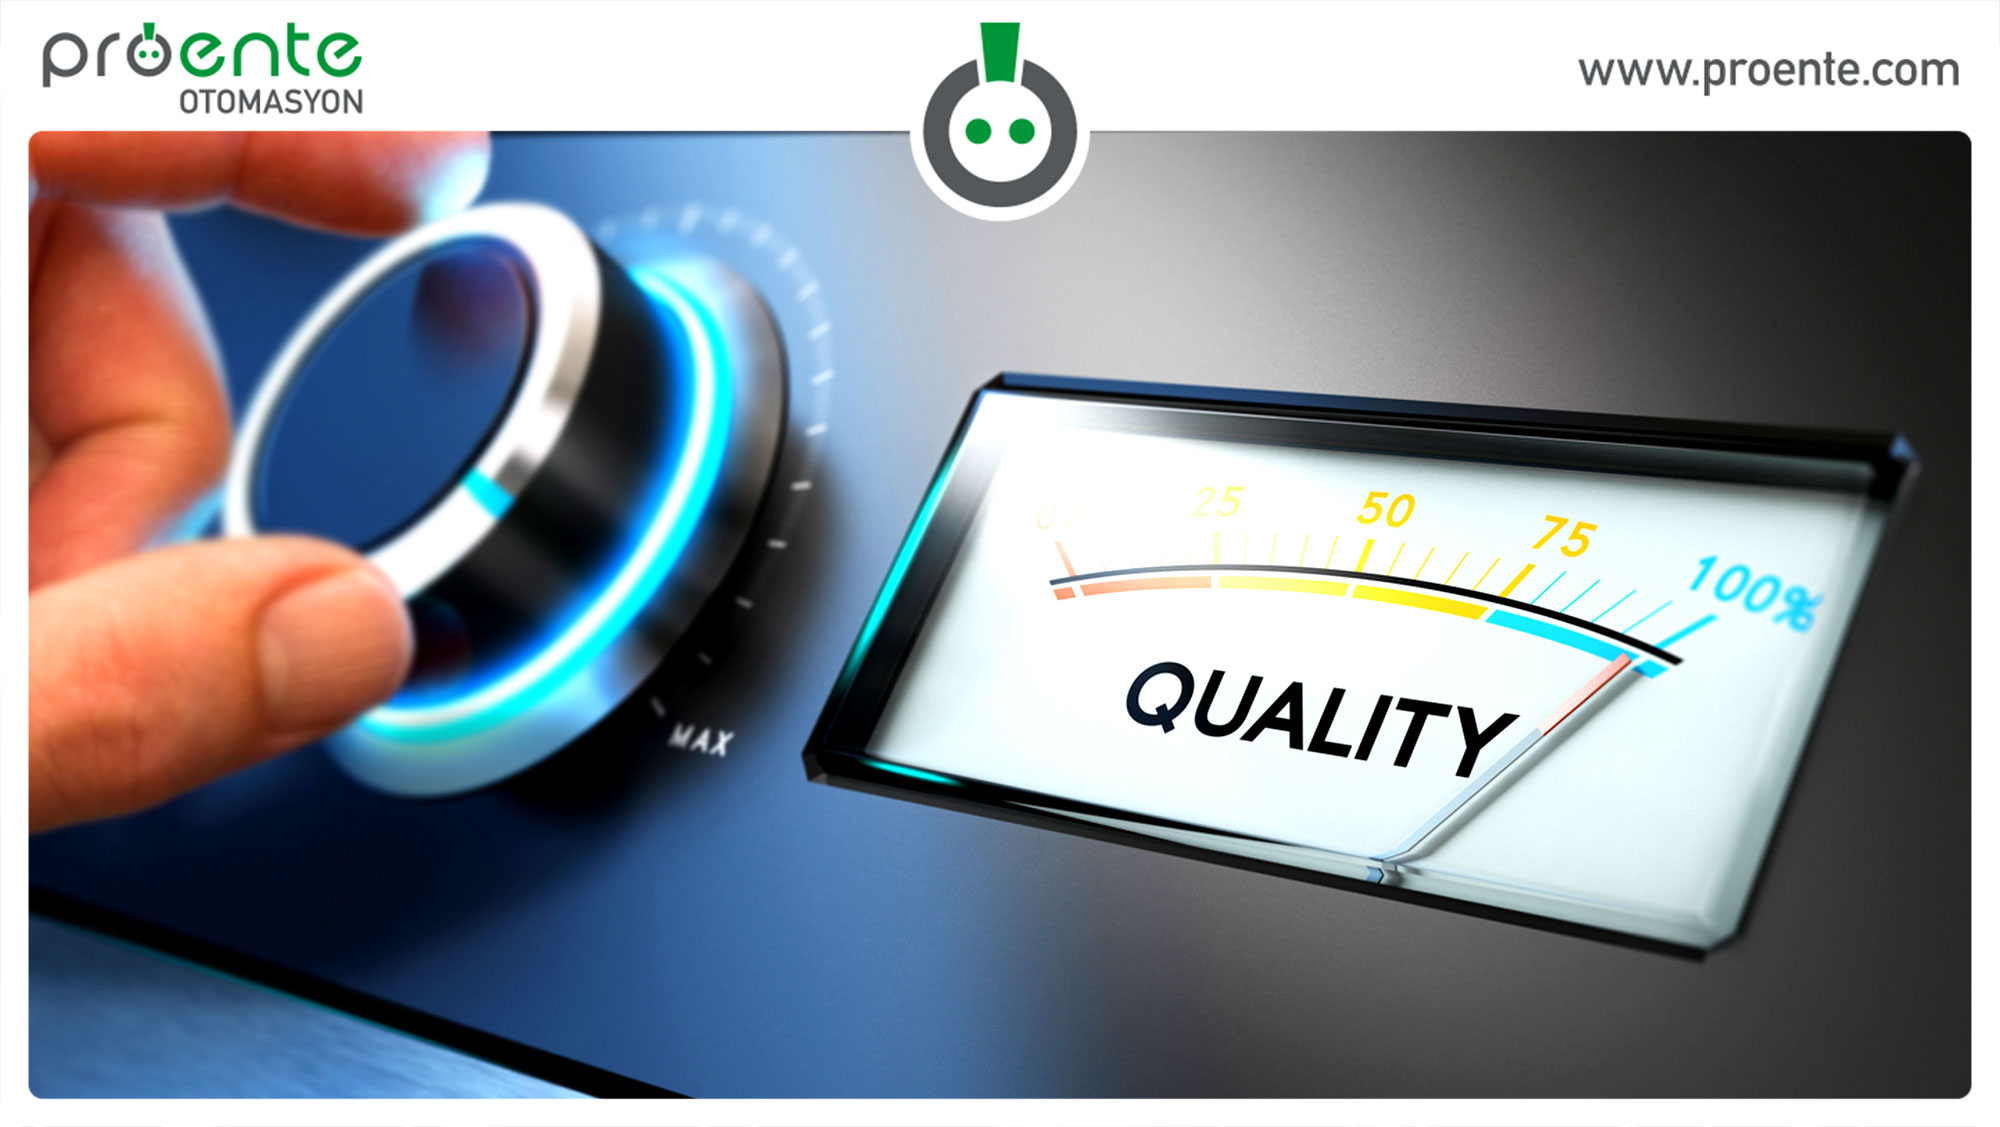 kaliteli üretim, kalite, üretim, quality, best quality,